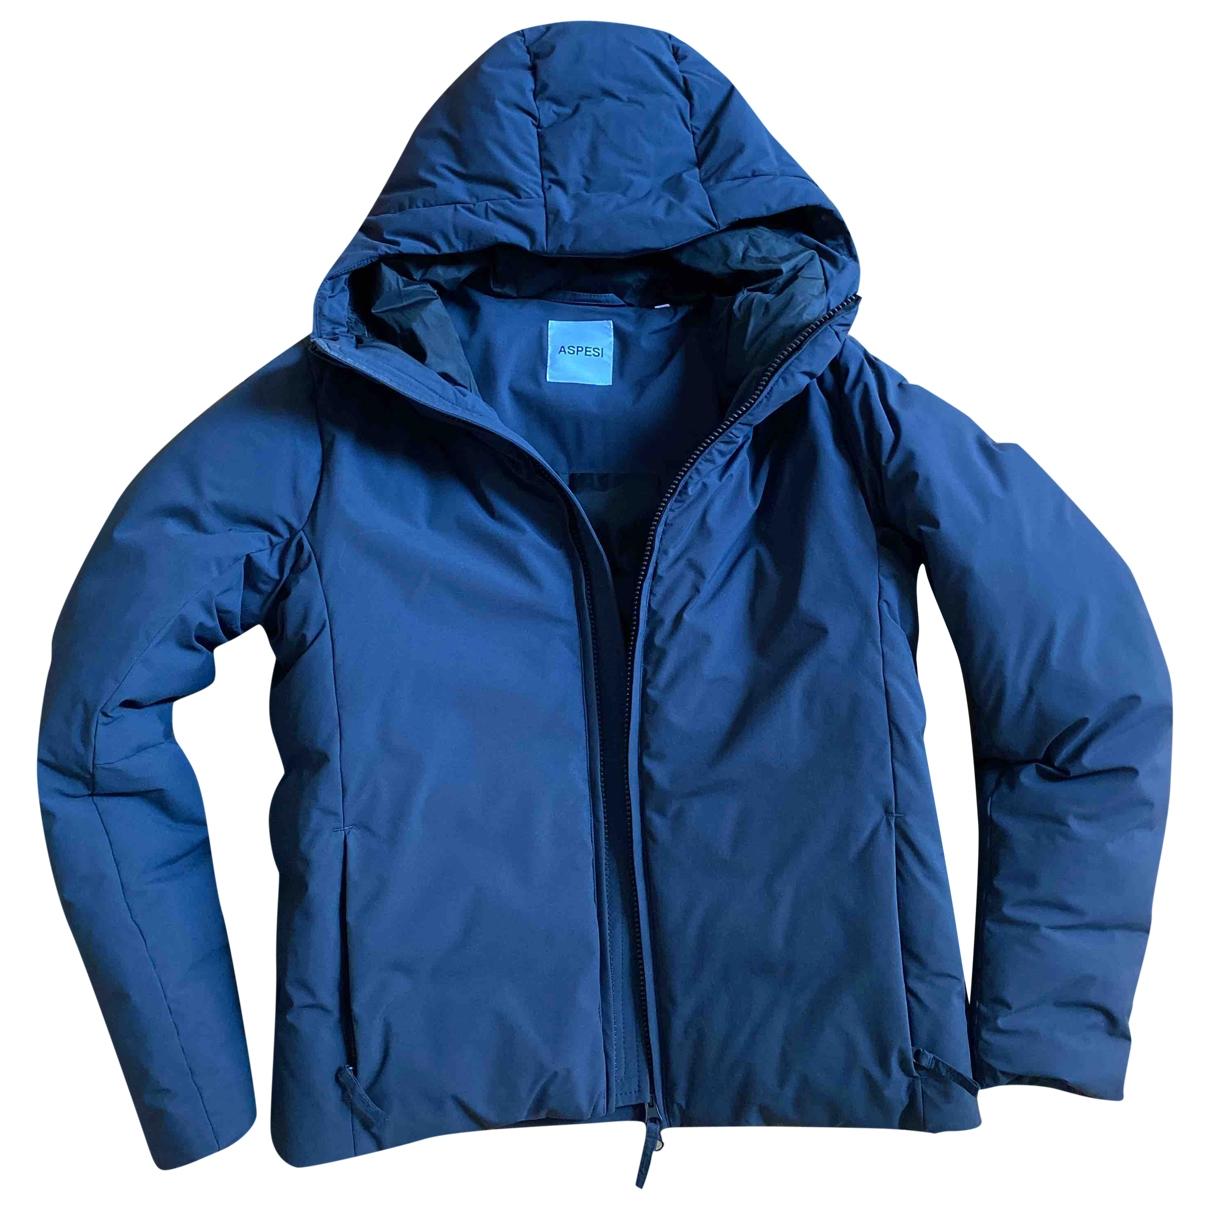 Aspesi \N Blue jacket for Women S International